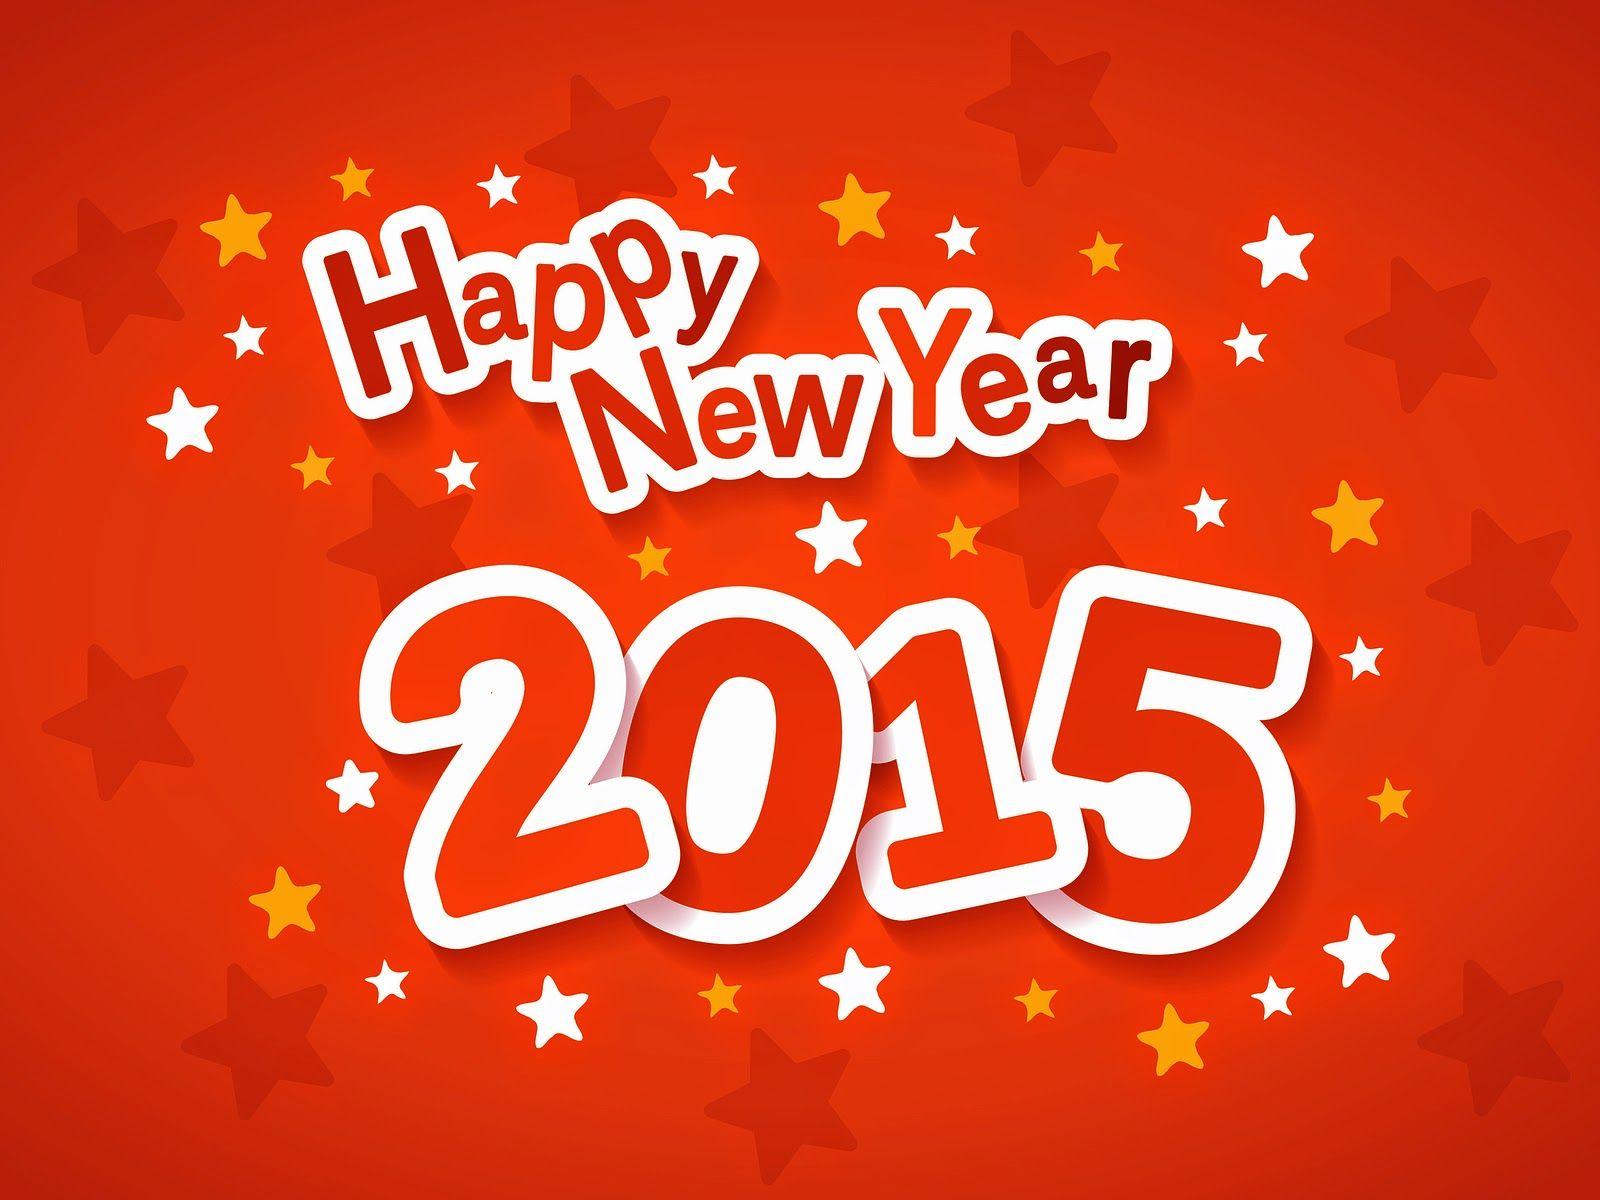 Happy newyear greetings happy new year 2015 get knowledge and happy newyear greetings happy new year 2015 m4hsunfo